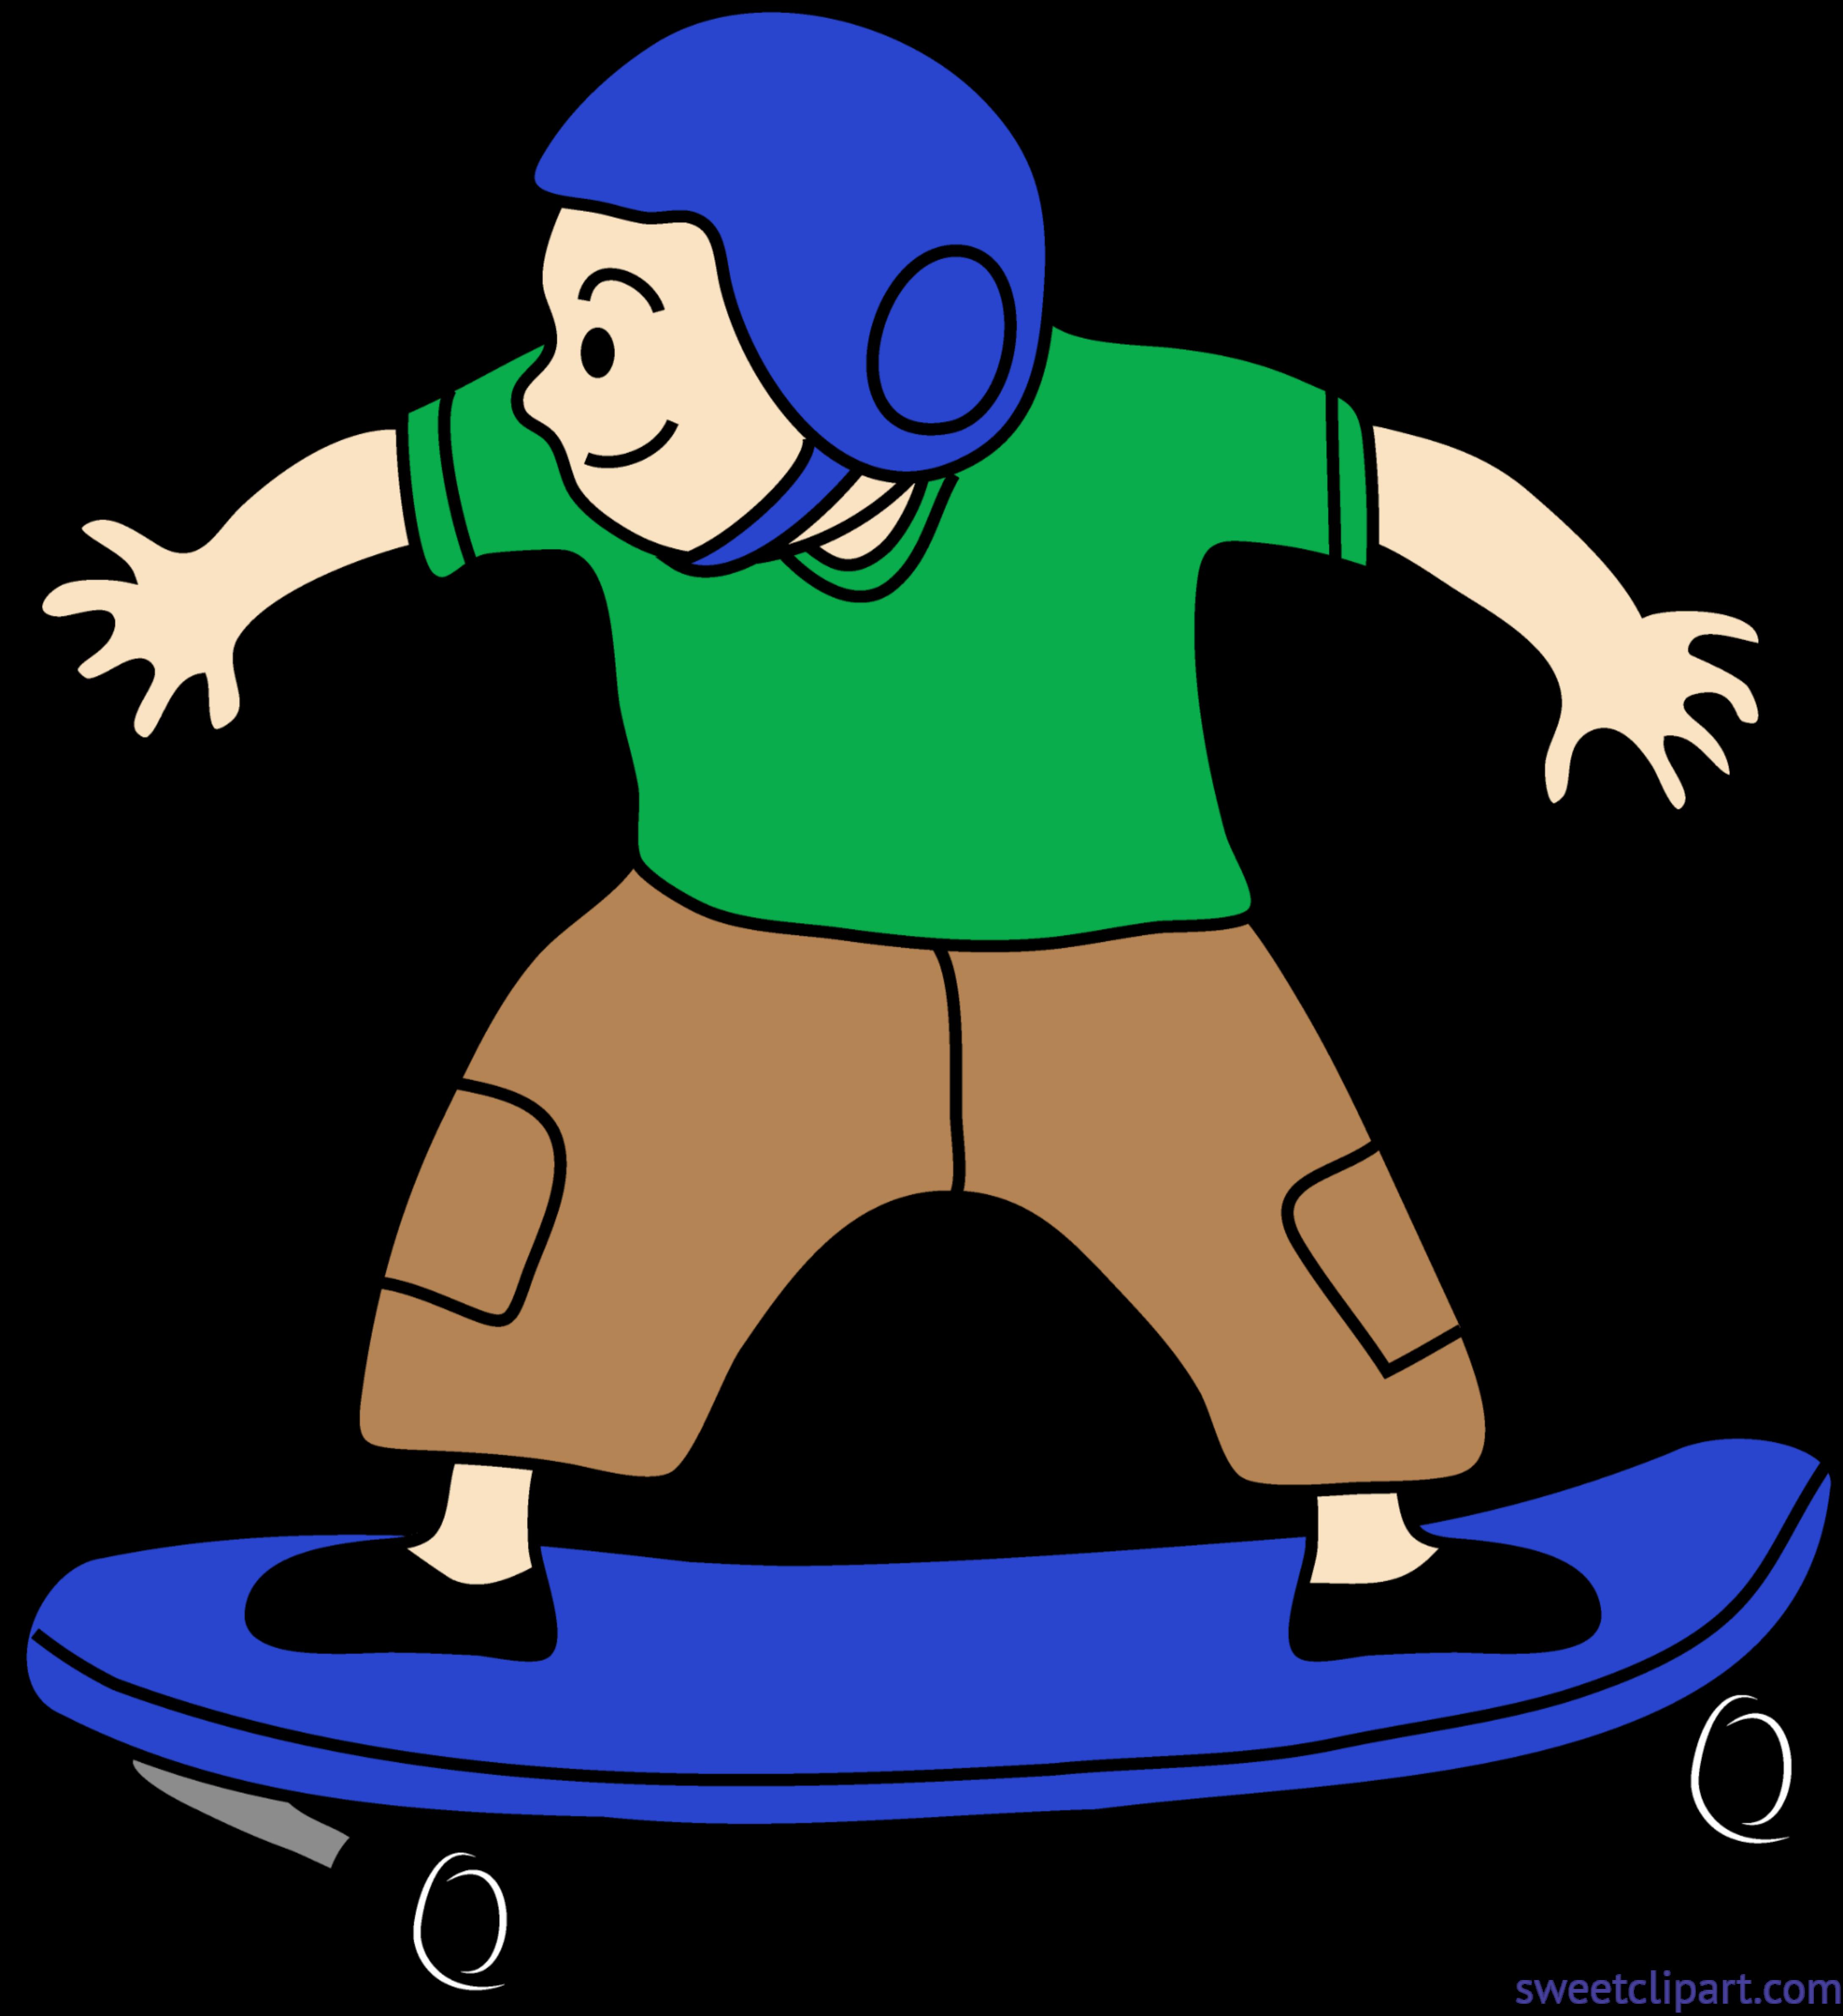 skateboarding kid clip art sweet clip art rh m sweetclipart com skateboard clip art black and white free skateboarding clipart free